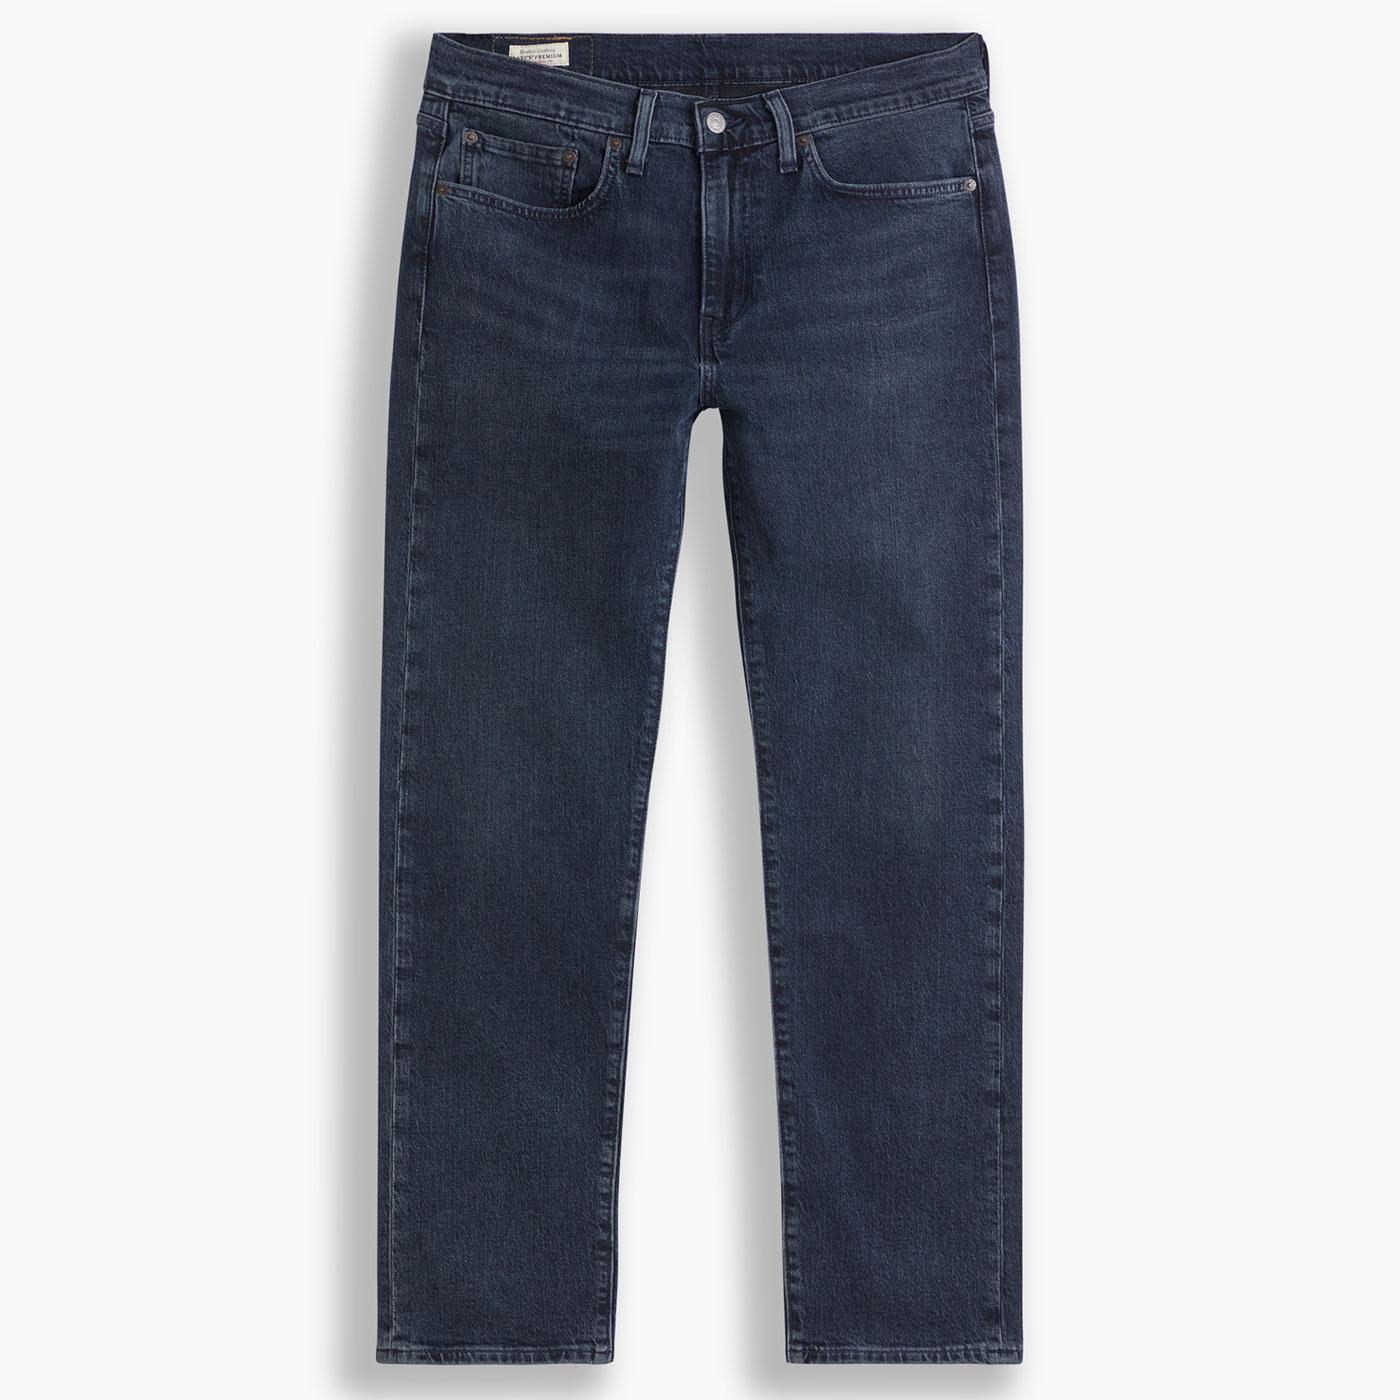 LEVI'S 502 Taper Retro Mod Jeans (Sugar High)